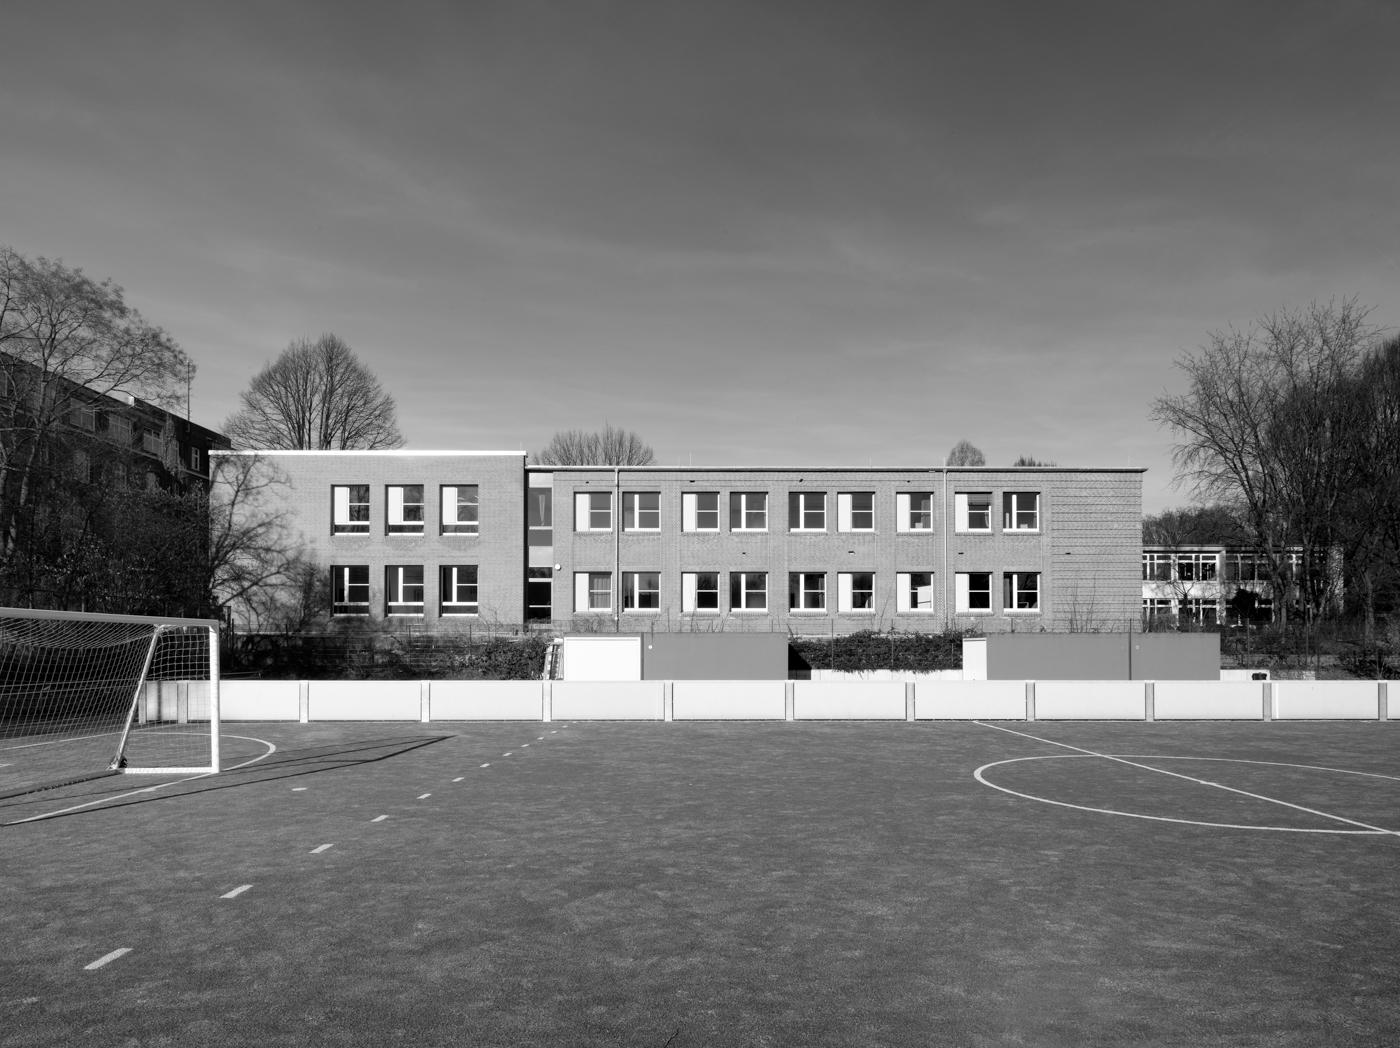 Heinrich-Hertz-Schule